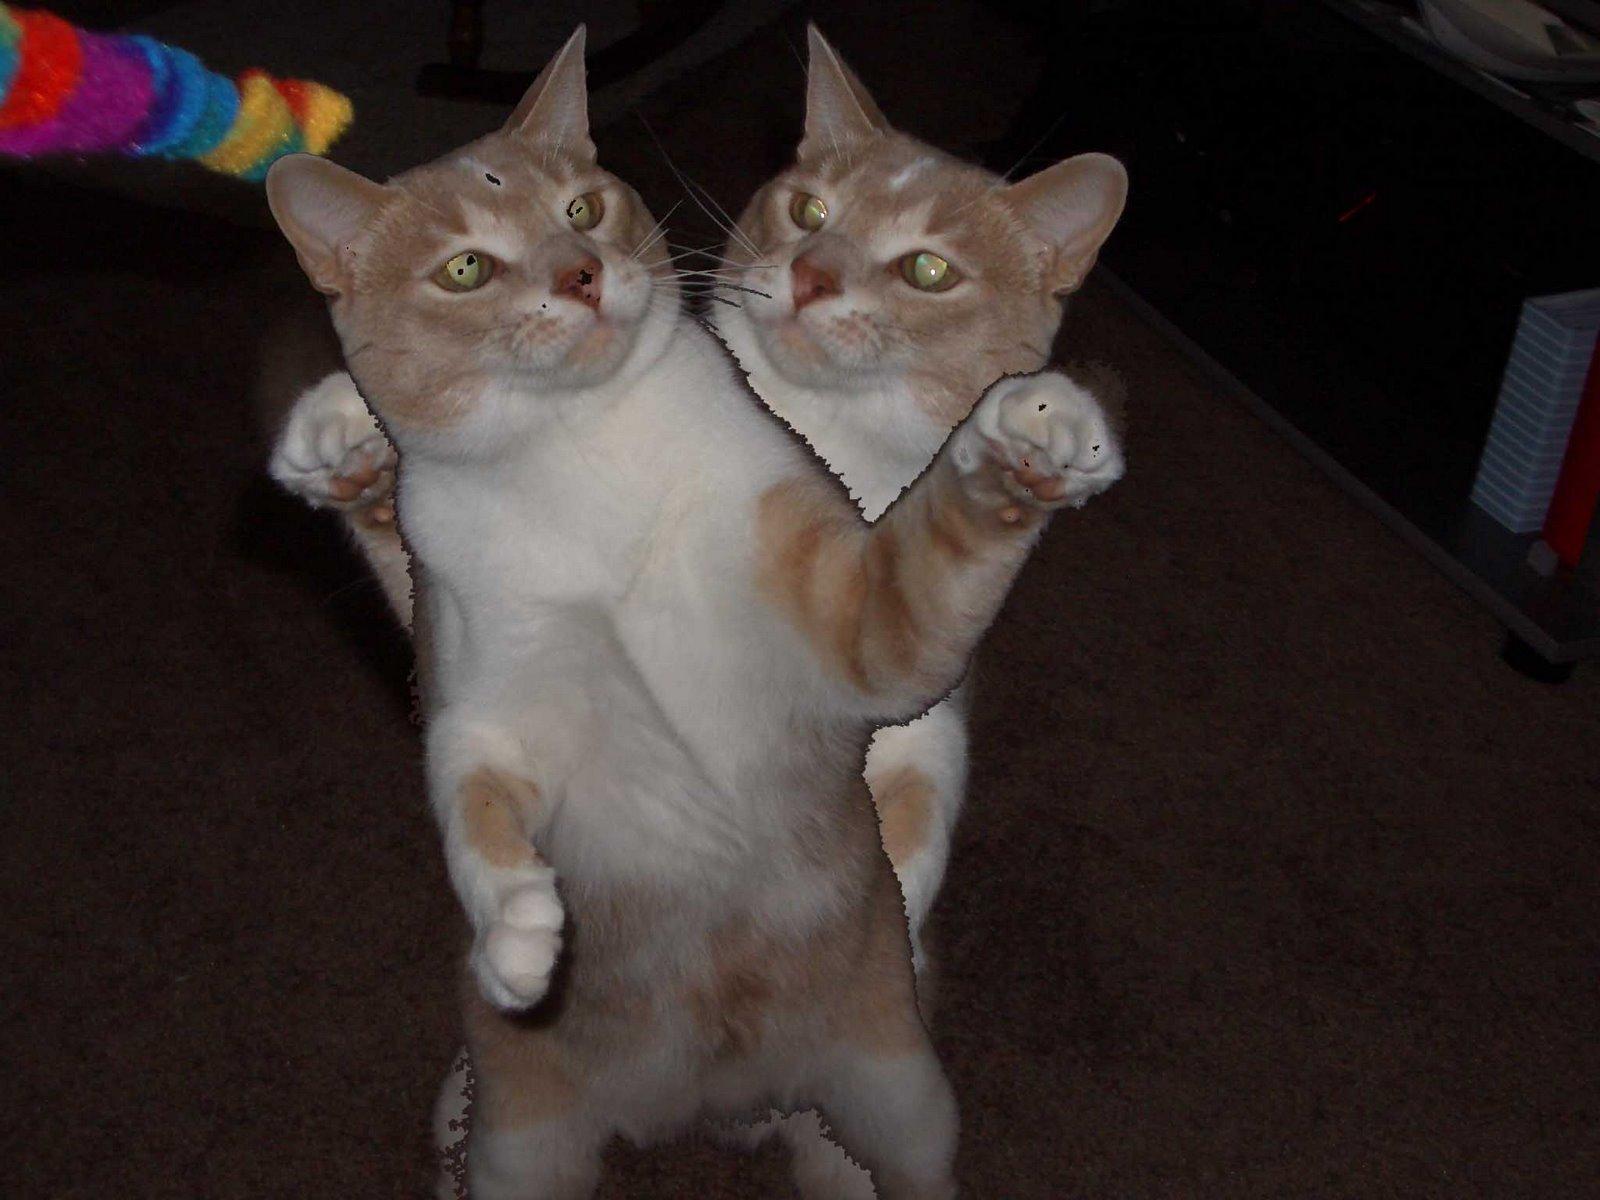 Cat Getting Beaten Up